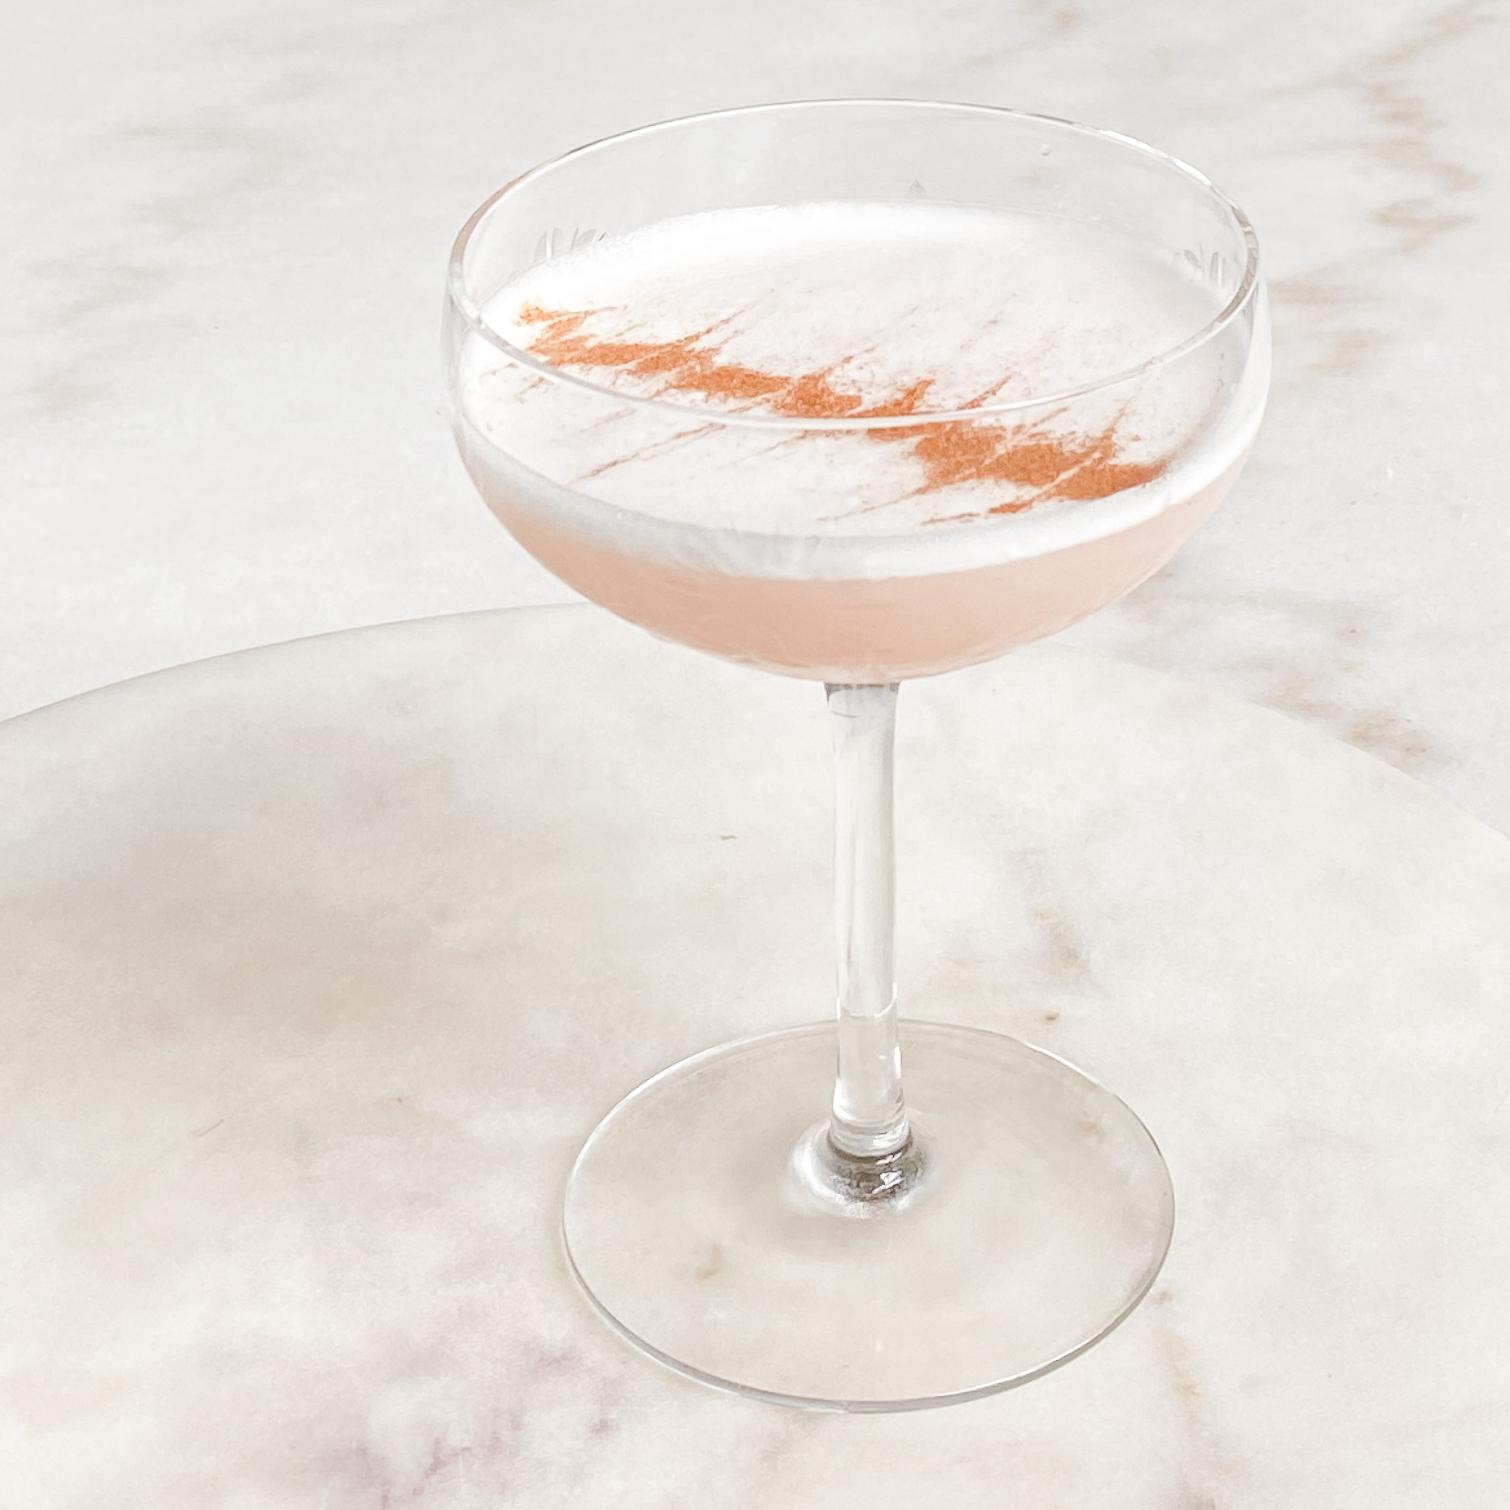 Rhubarb Cinnamon Sour